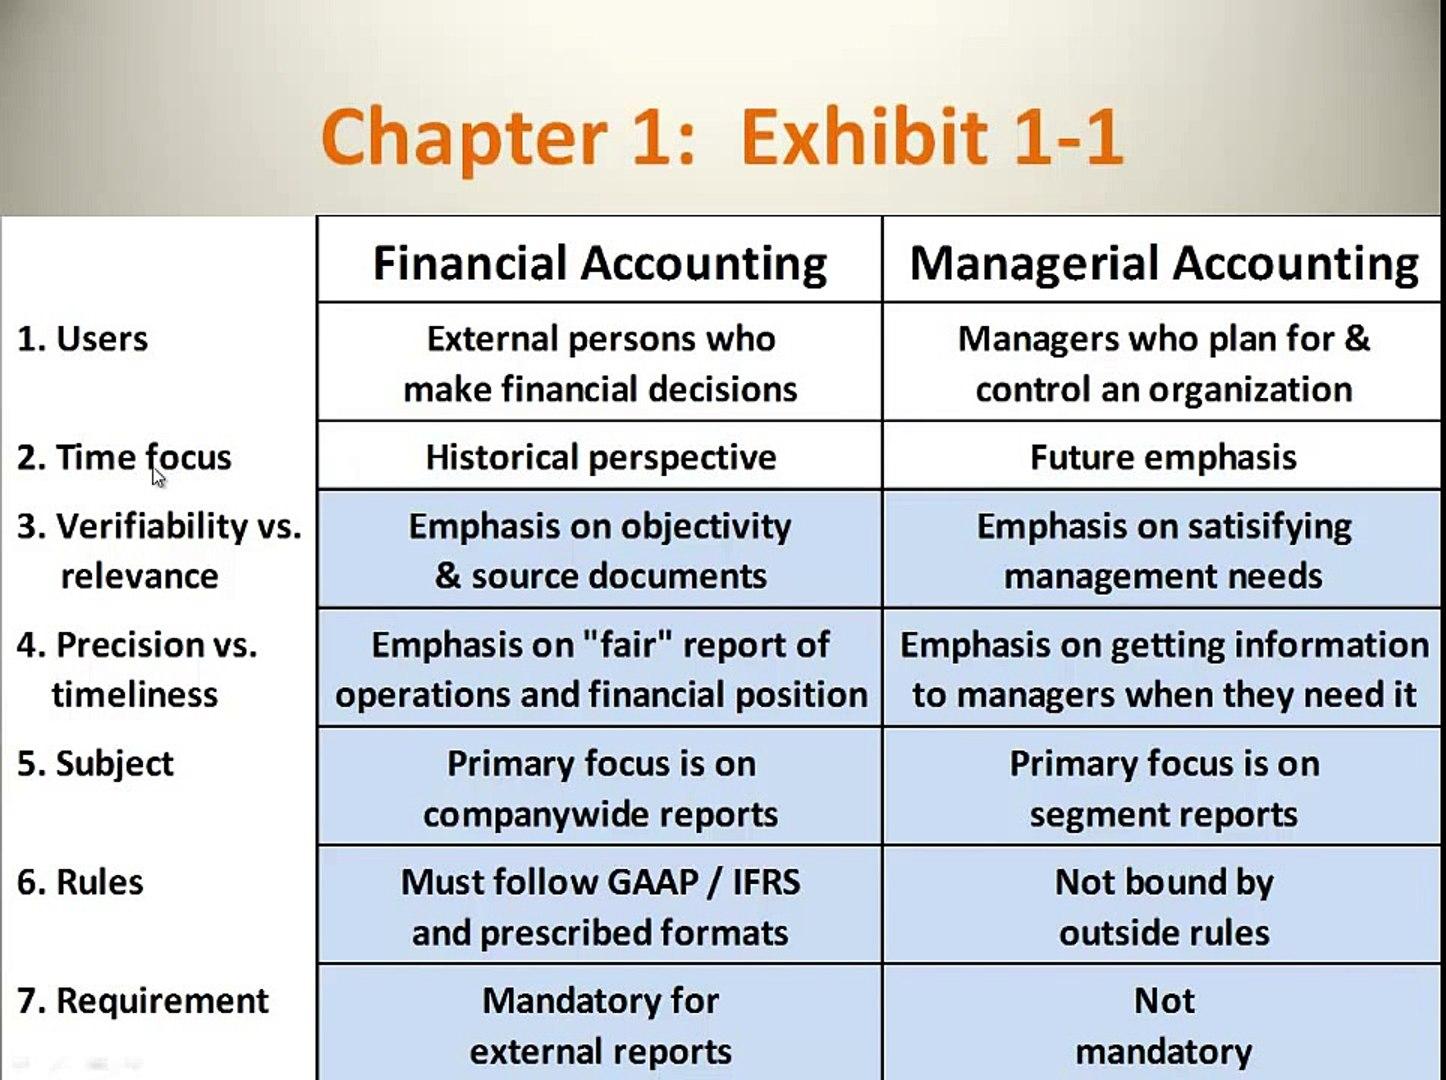 Financial Accounting vs Managerial Accounting